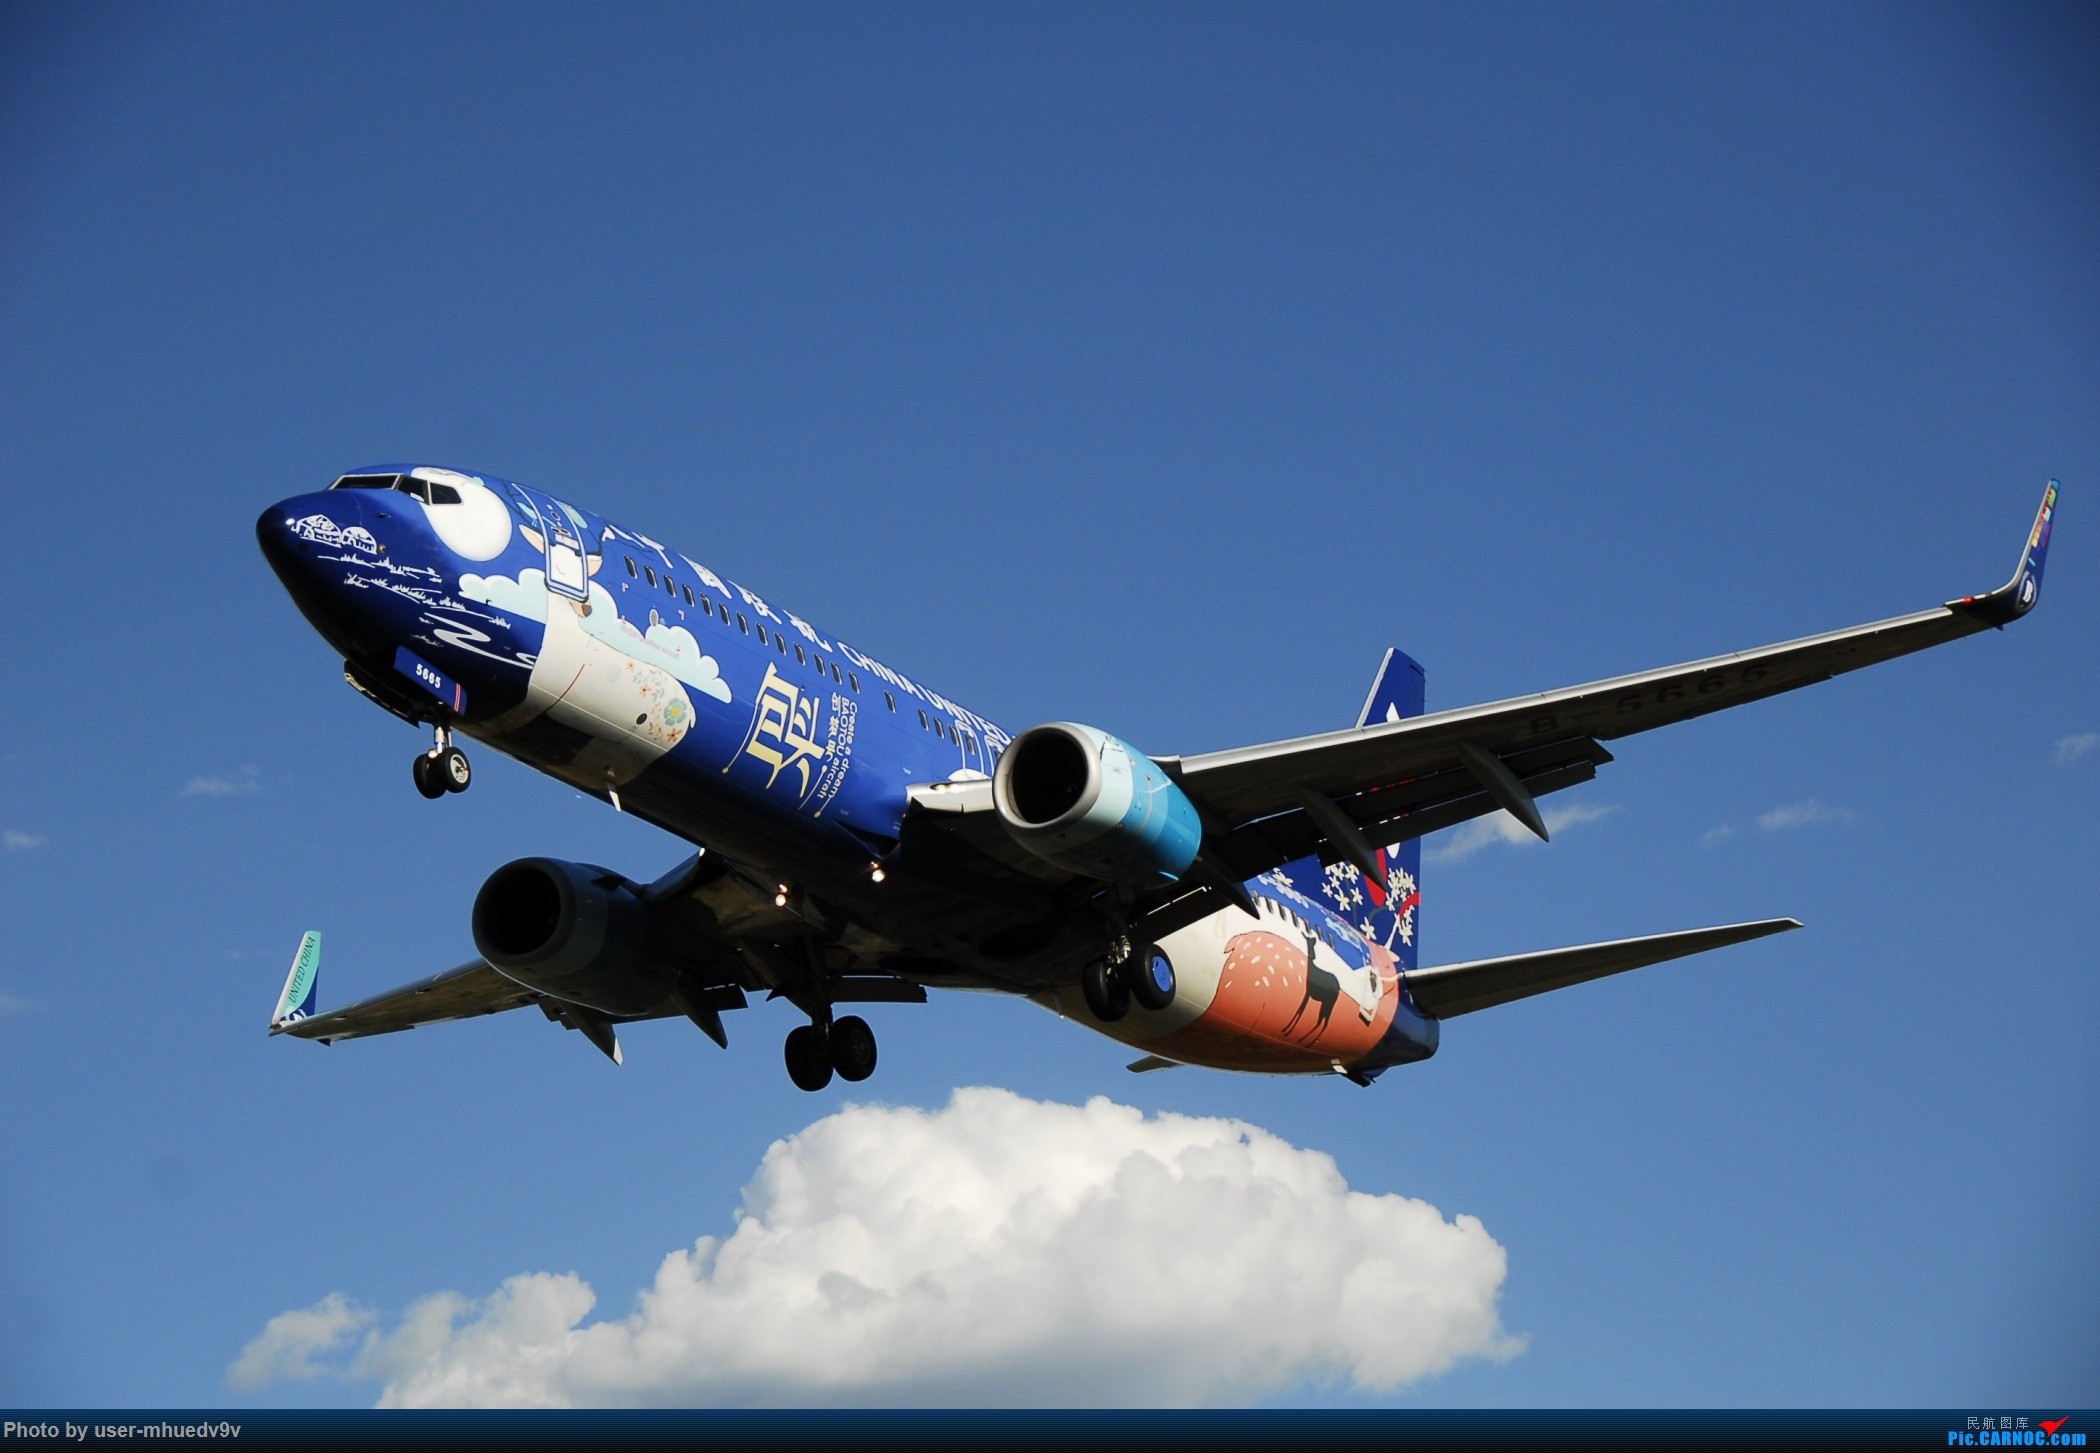 Re:[原创]暑假旅拍(旅途中拍机。。。) BOEING 737-800 B-5665 中国北京南苑机场